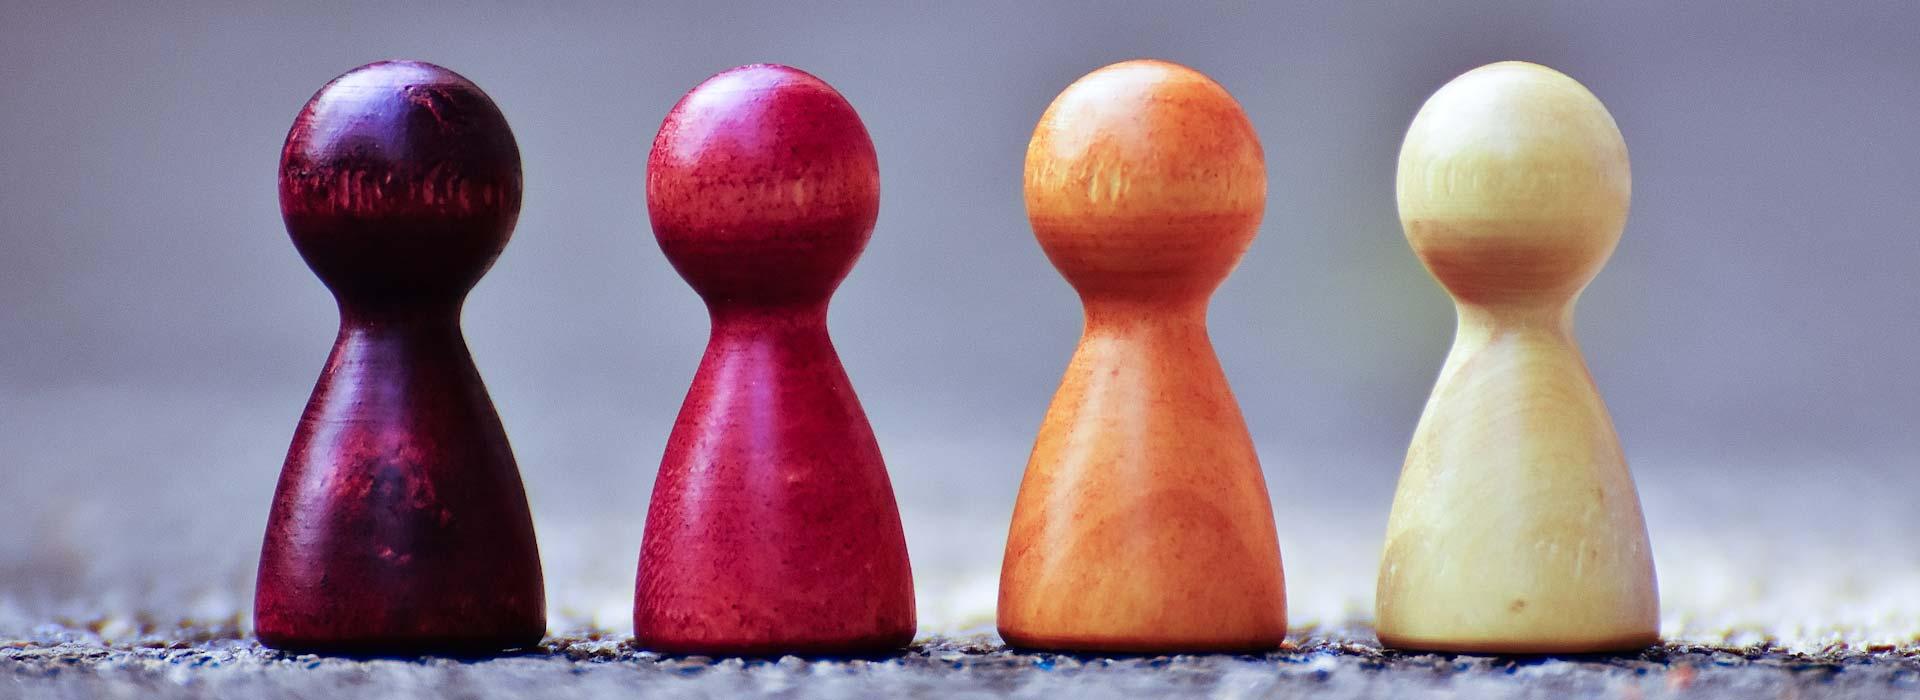 blog-psychotherapeut-spielfiguren-stehen-fuer-berufsgruppen